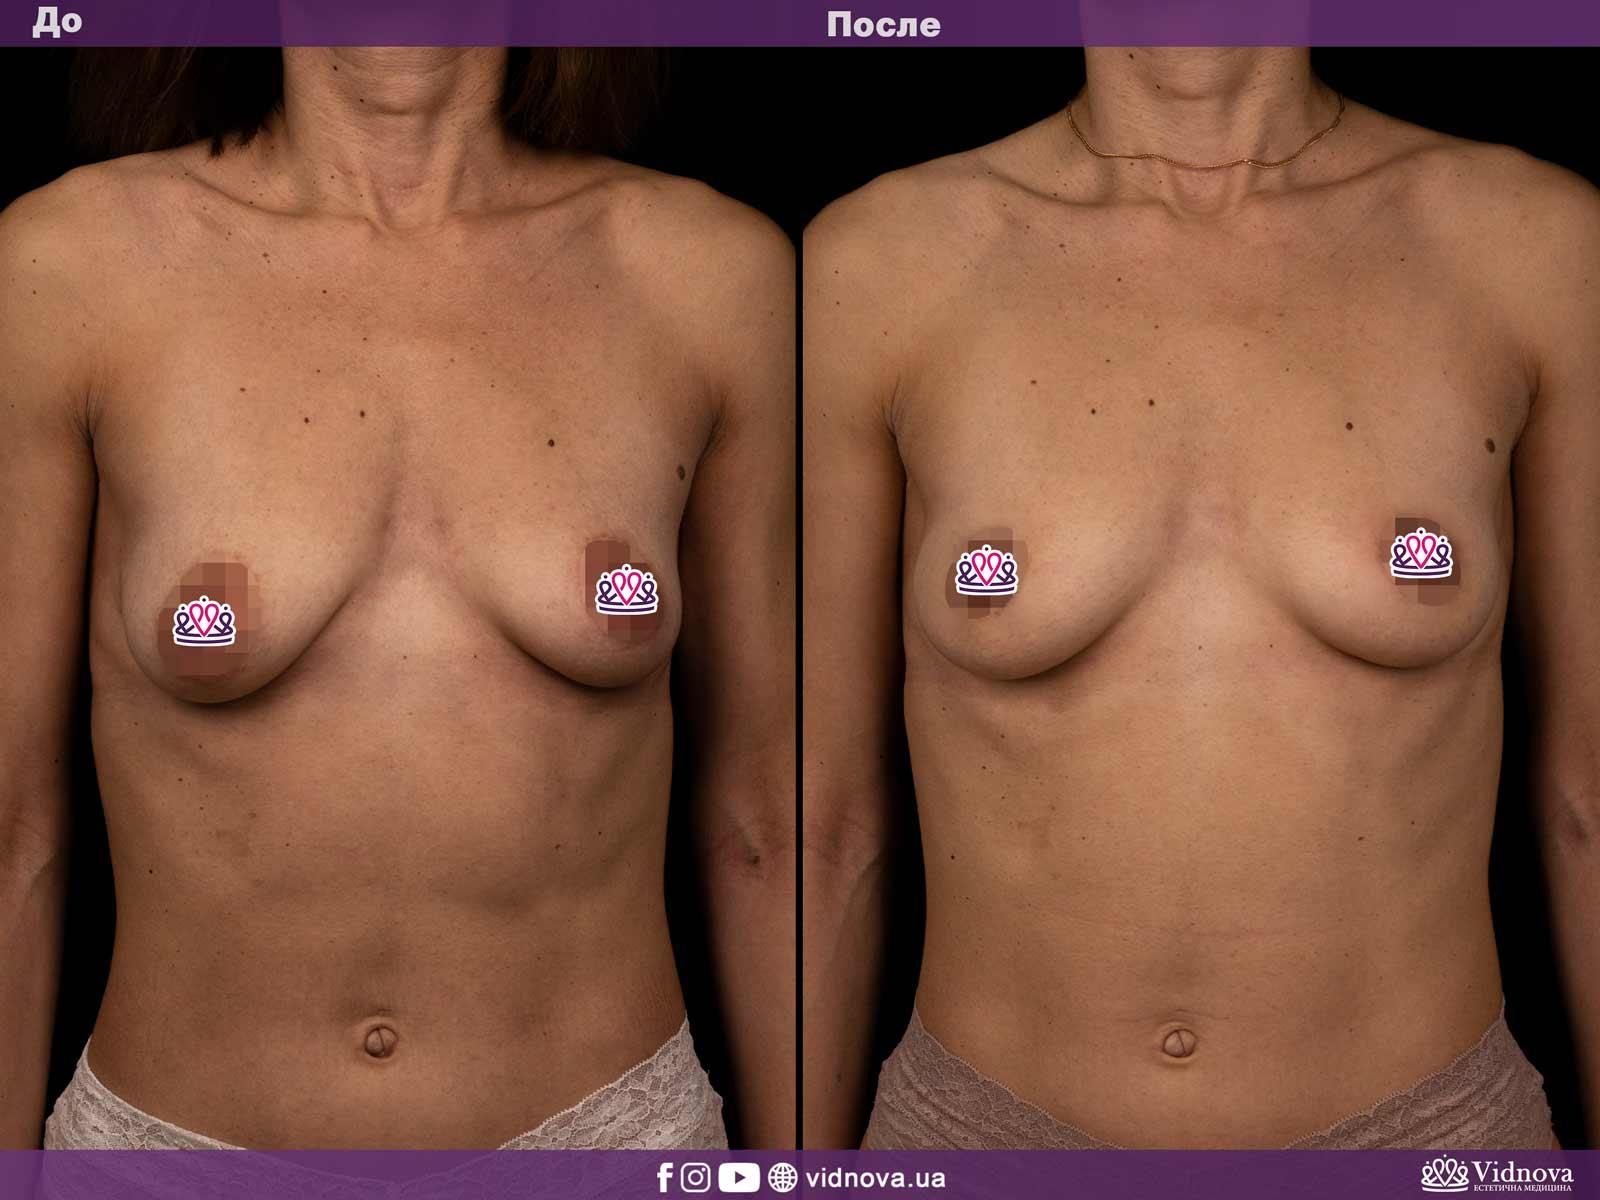 Подтяжка груди: Фото ДО и ПОСЛЕ - Пример №9-1 - Клиника Vidnova